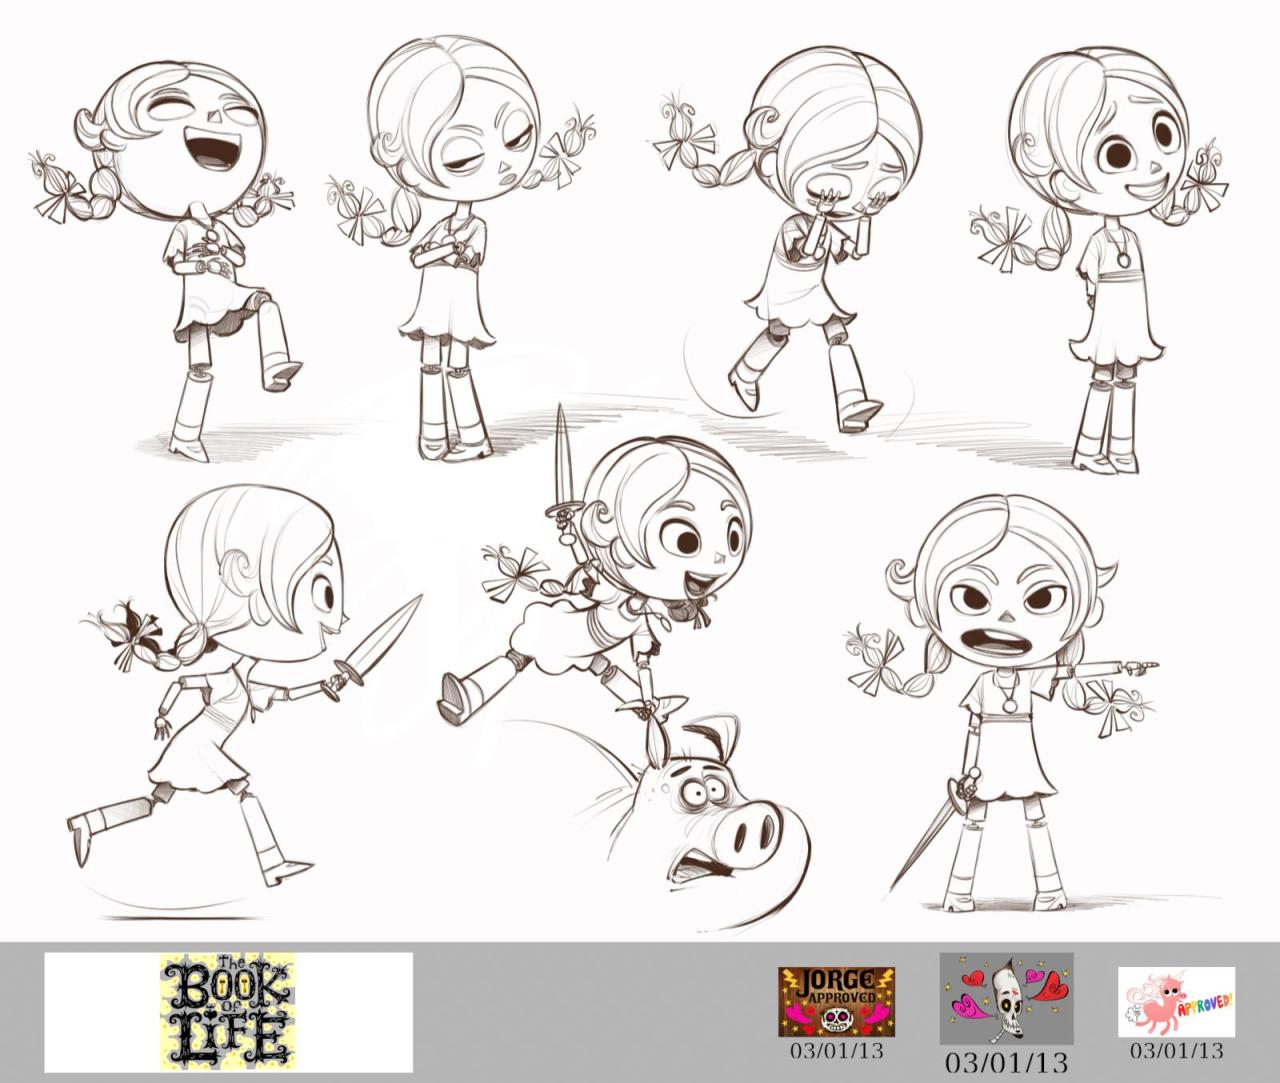 Character Design Book Of Life : Мультфильм Книга Жизни Концепт арты Марии youloveit